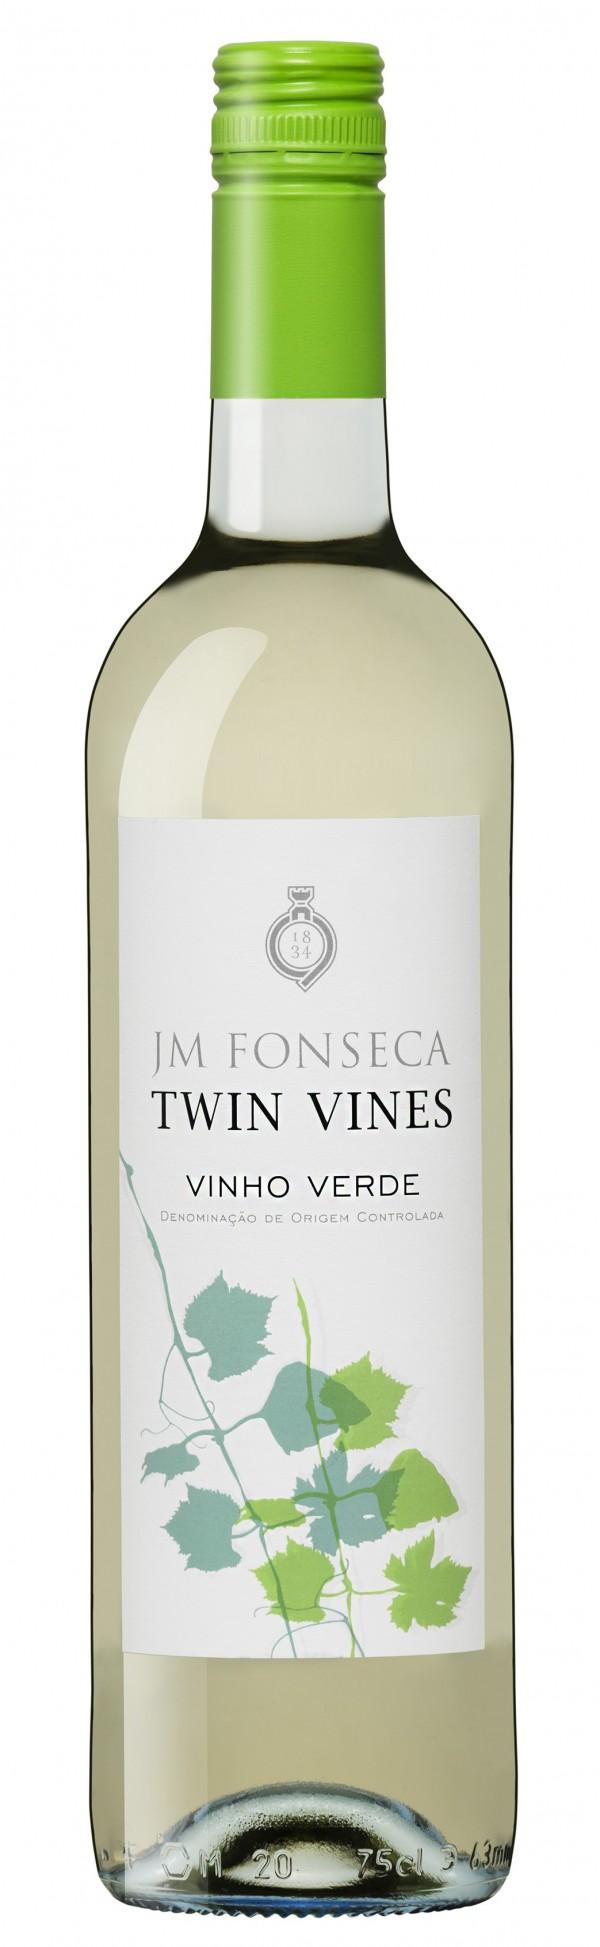 Twin Vines Vinho Verde